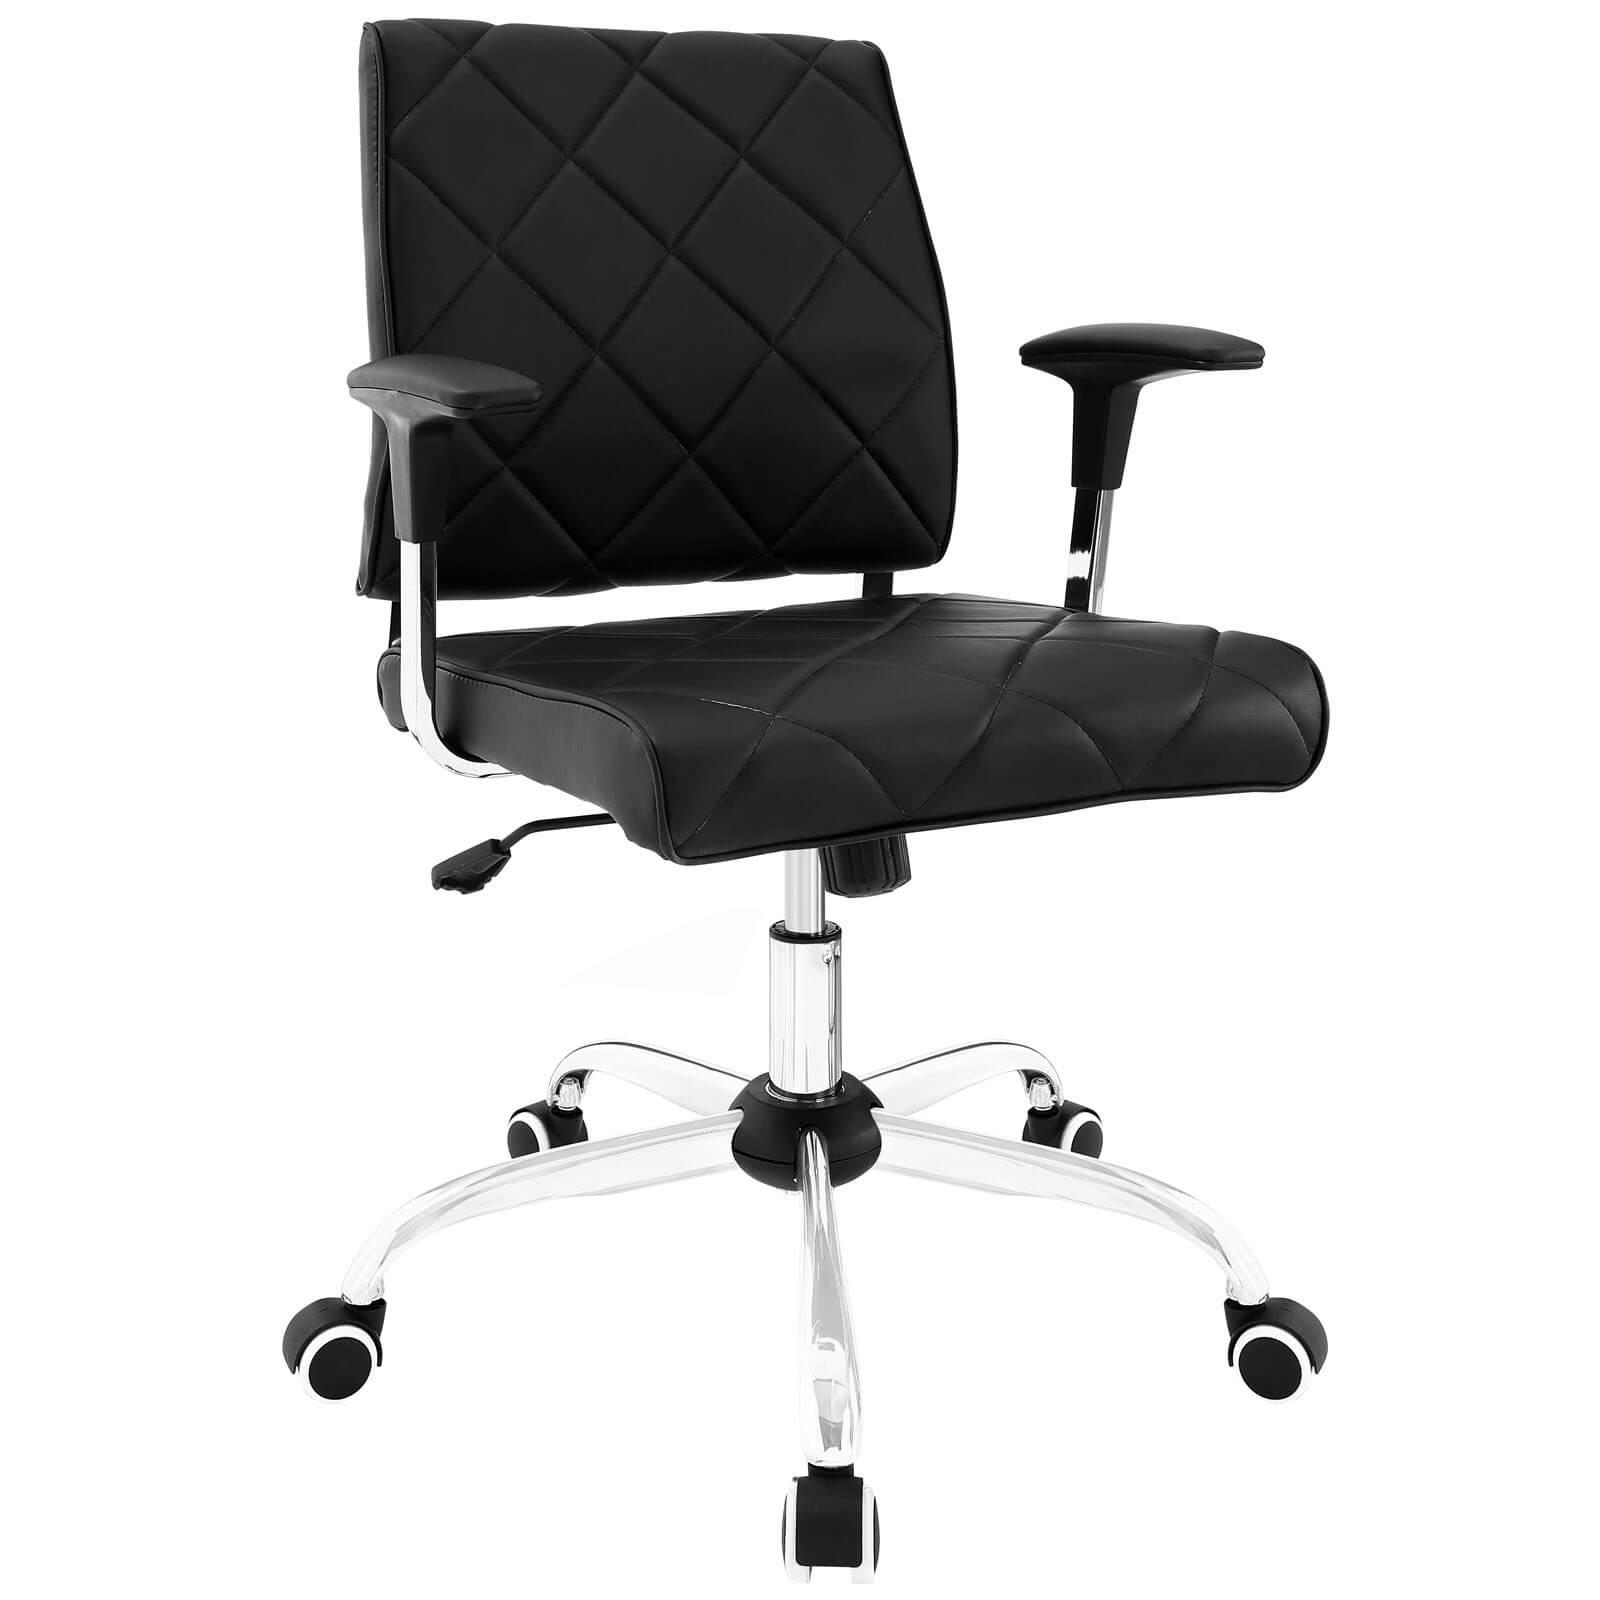 Lattice Vinyl fice Chair White Buy line at Best Price SohoMod